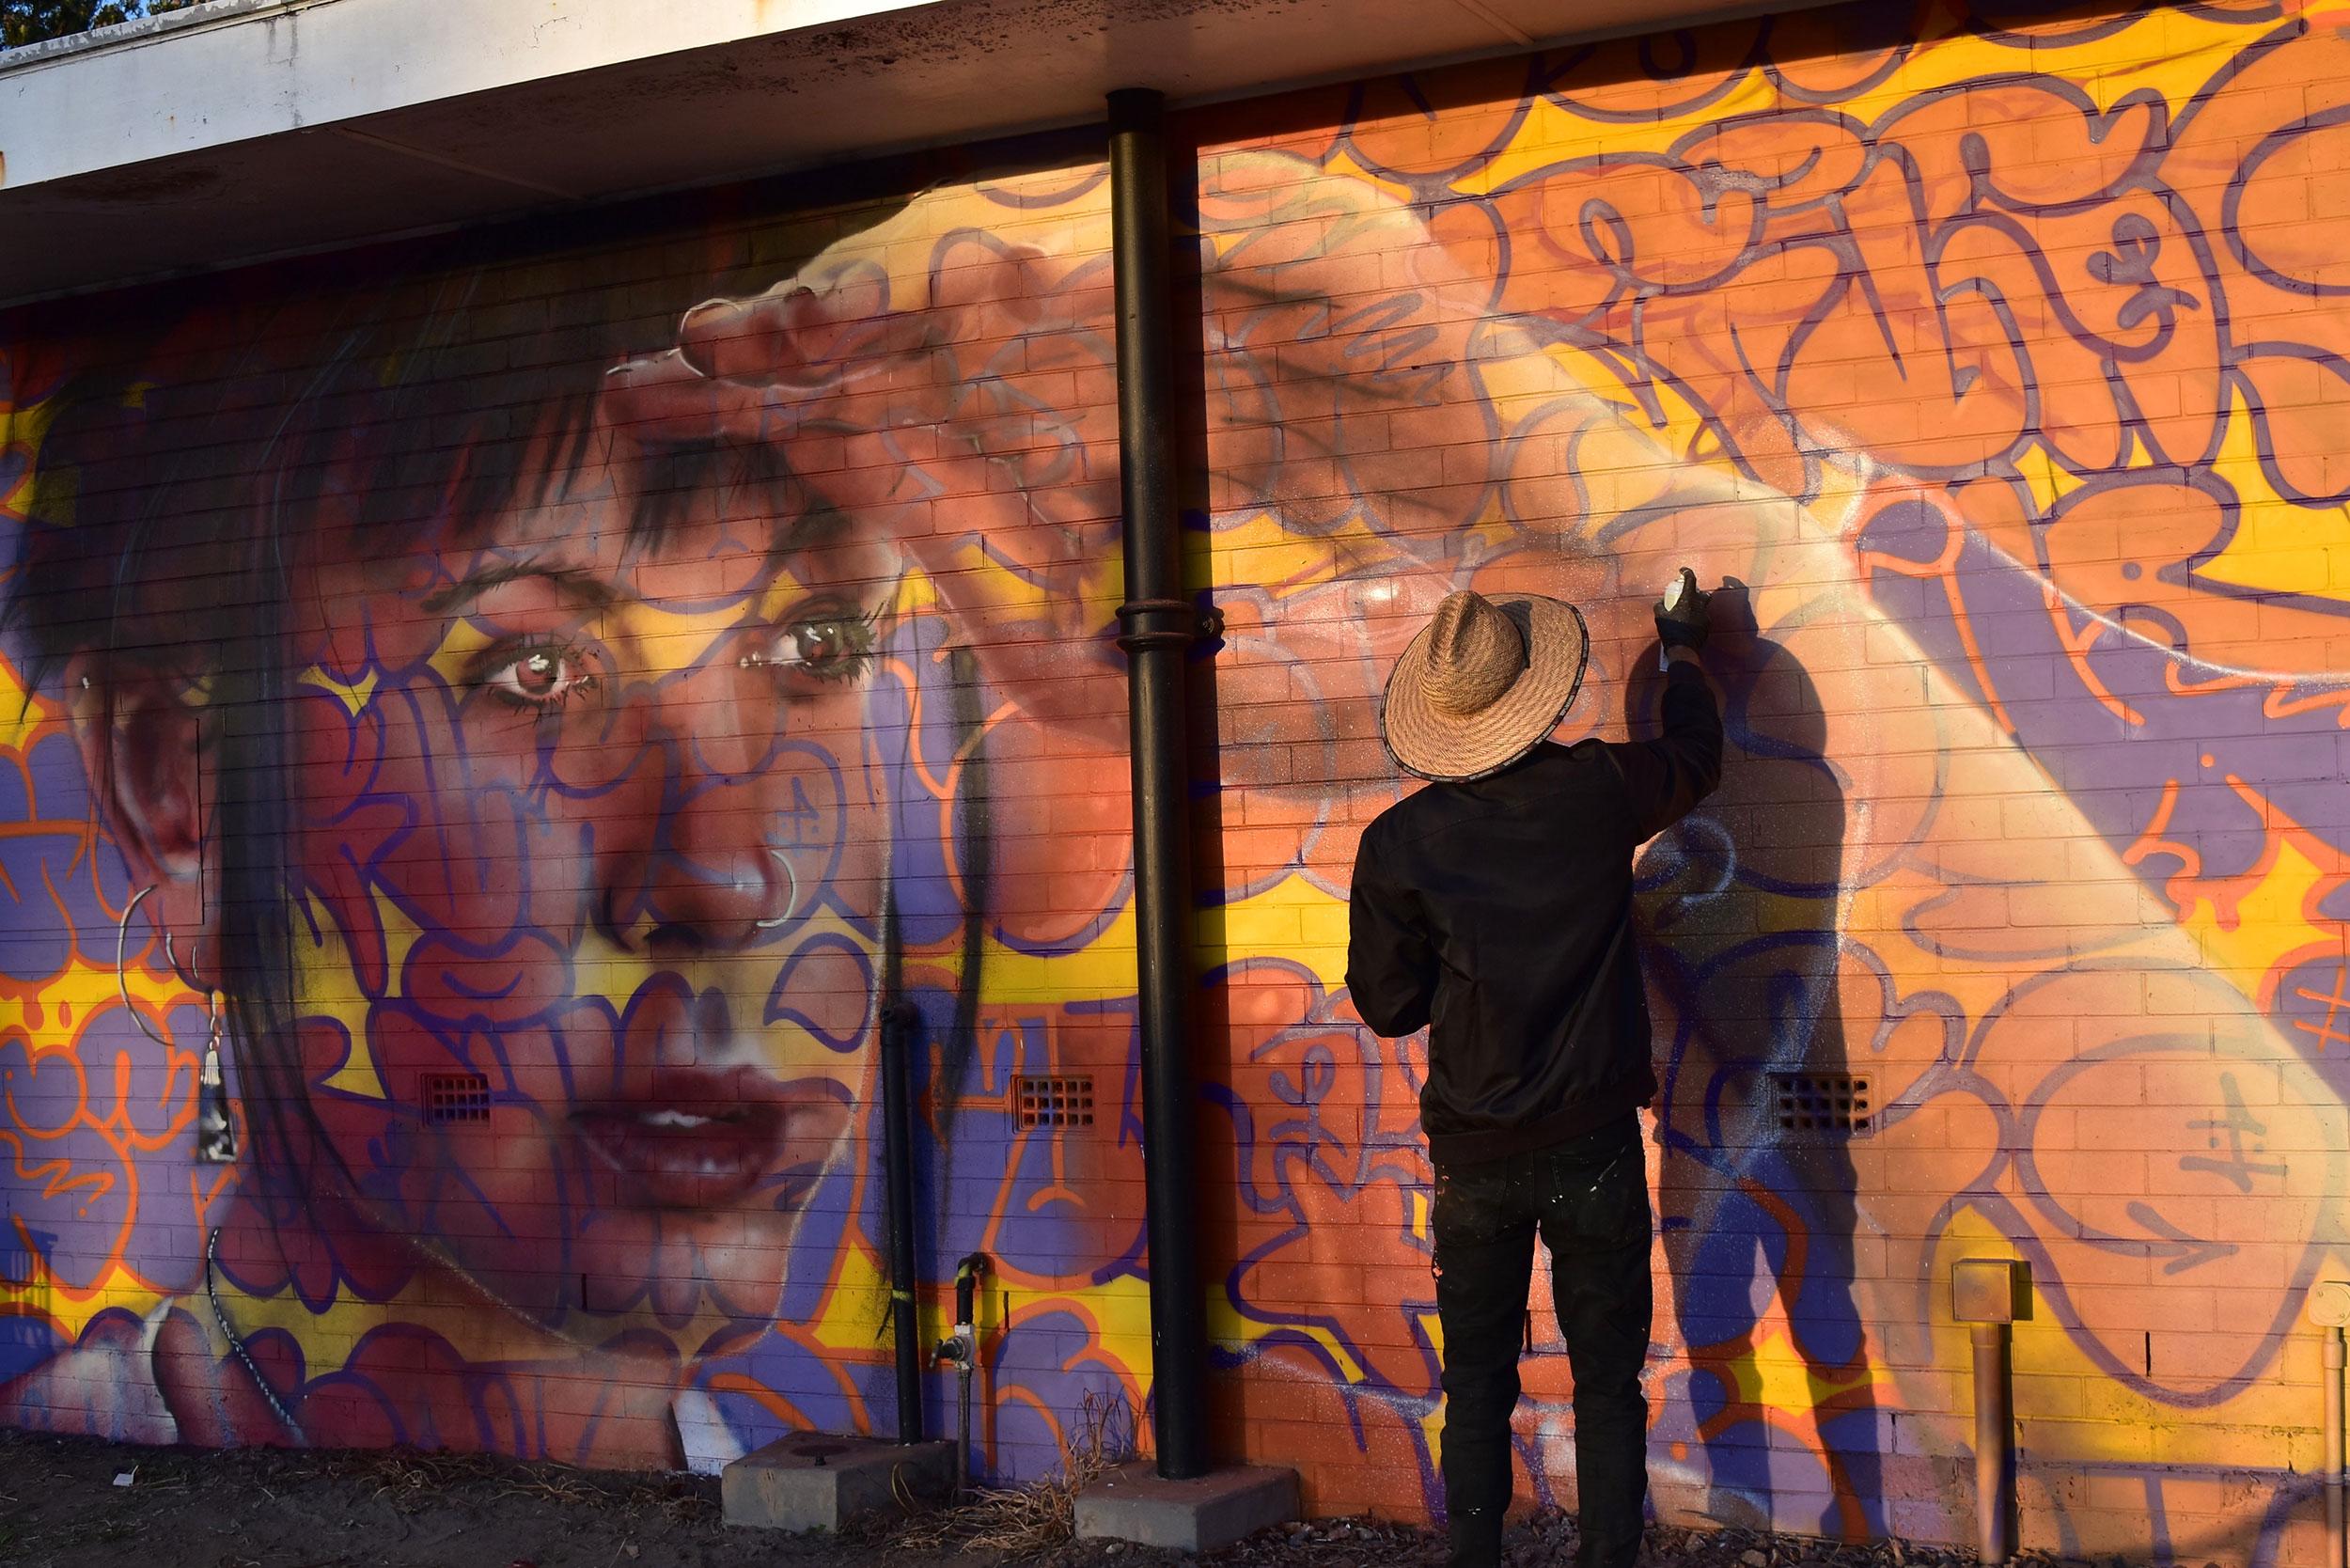 gus-eagleton-2015-sunshine-coast-street-art-project-sunshine-coast-2.jpg